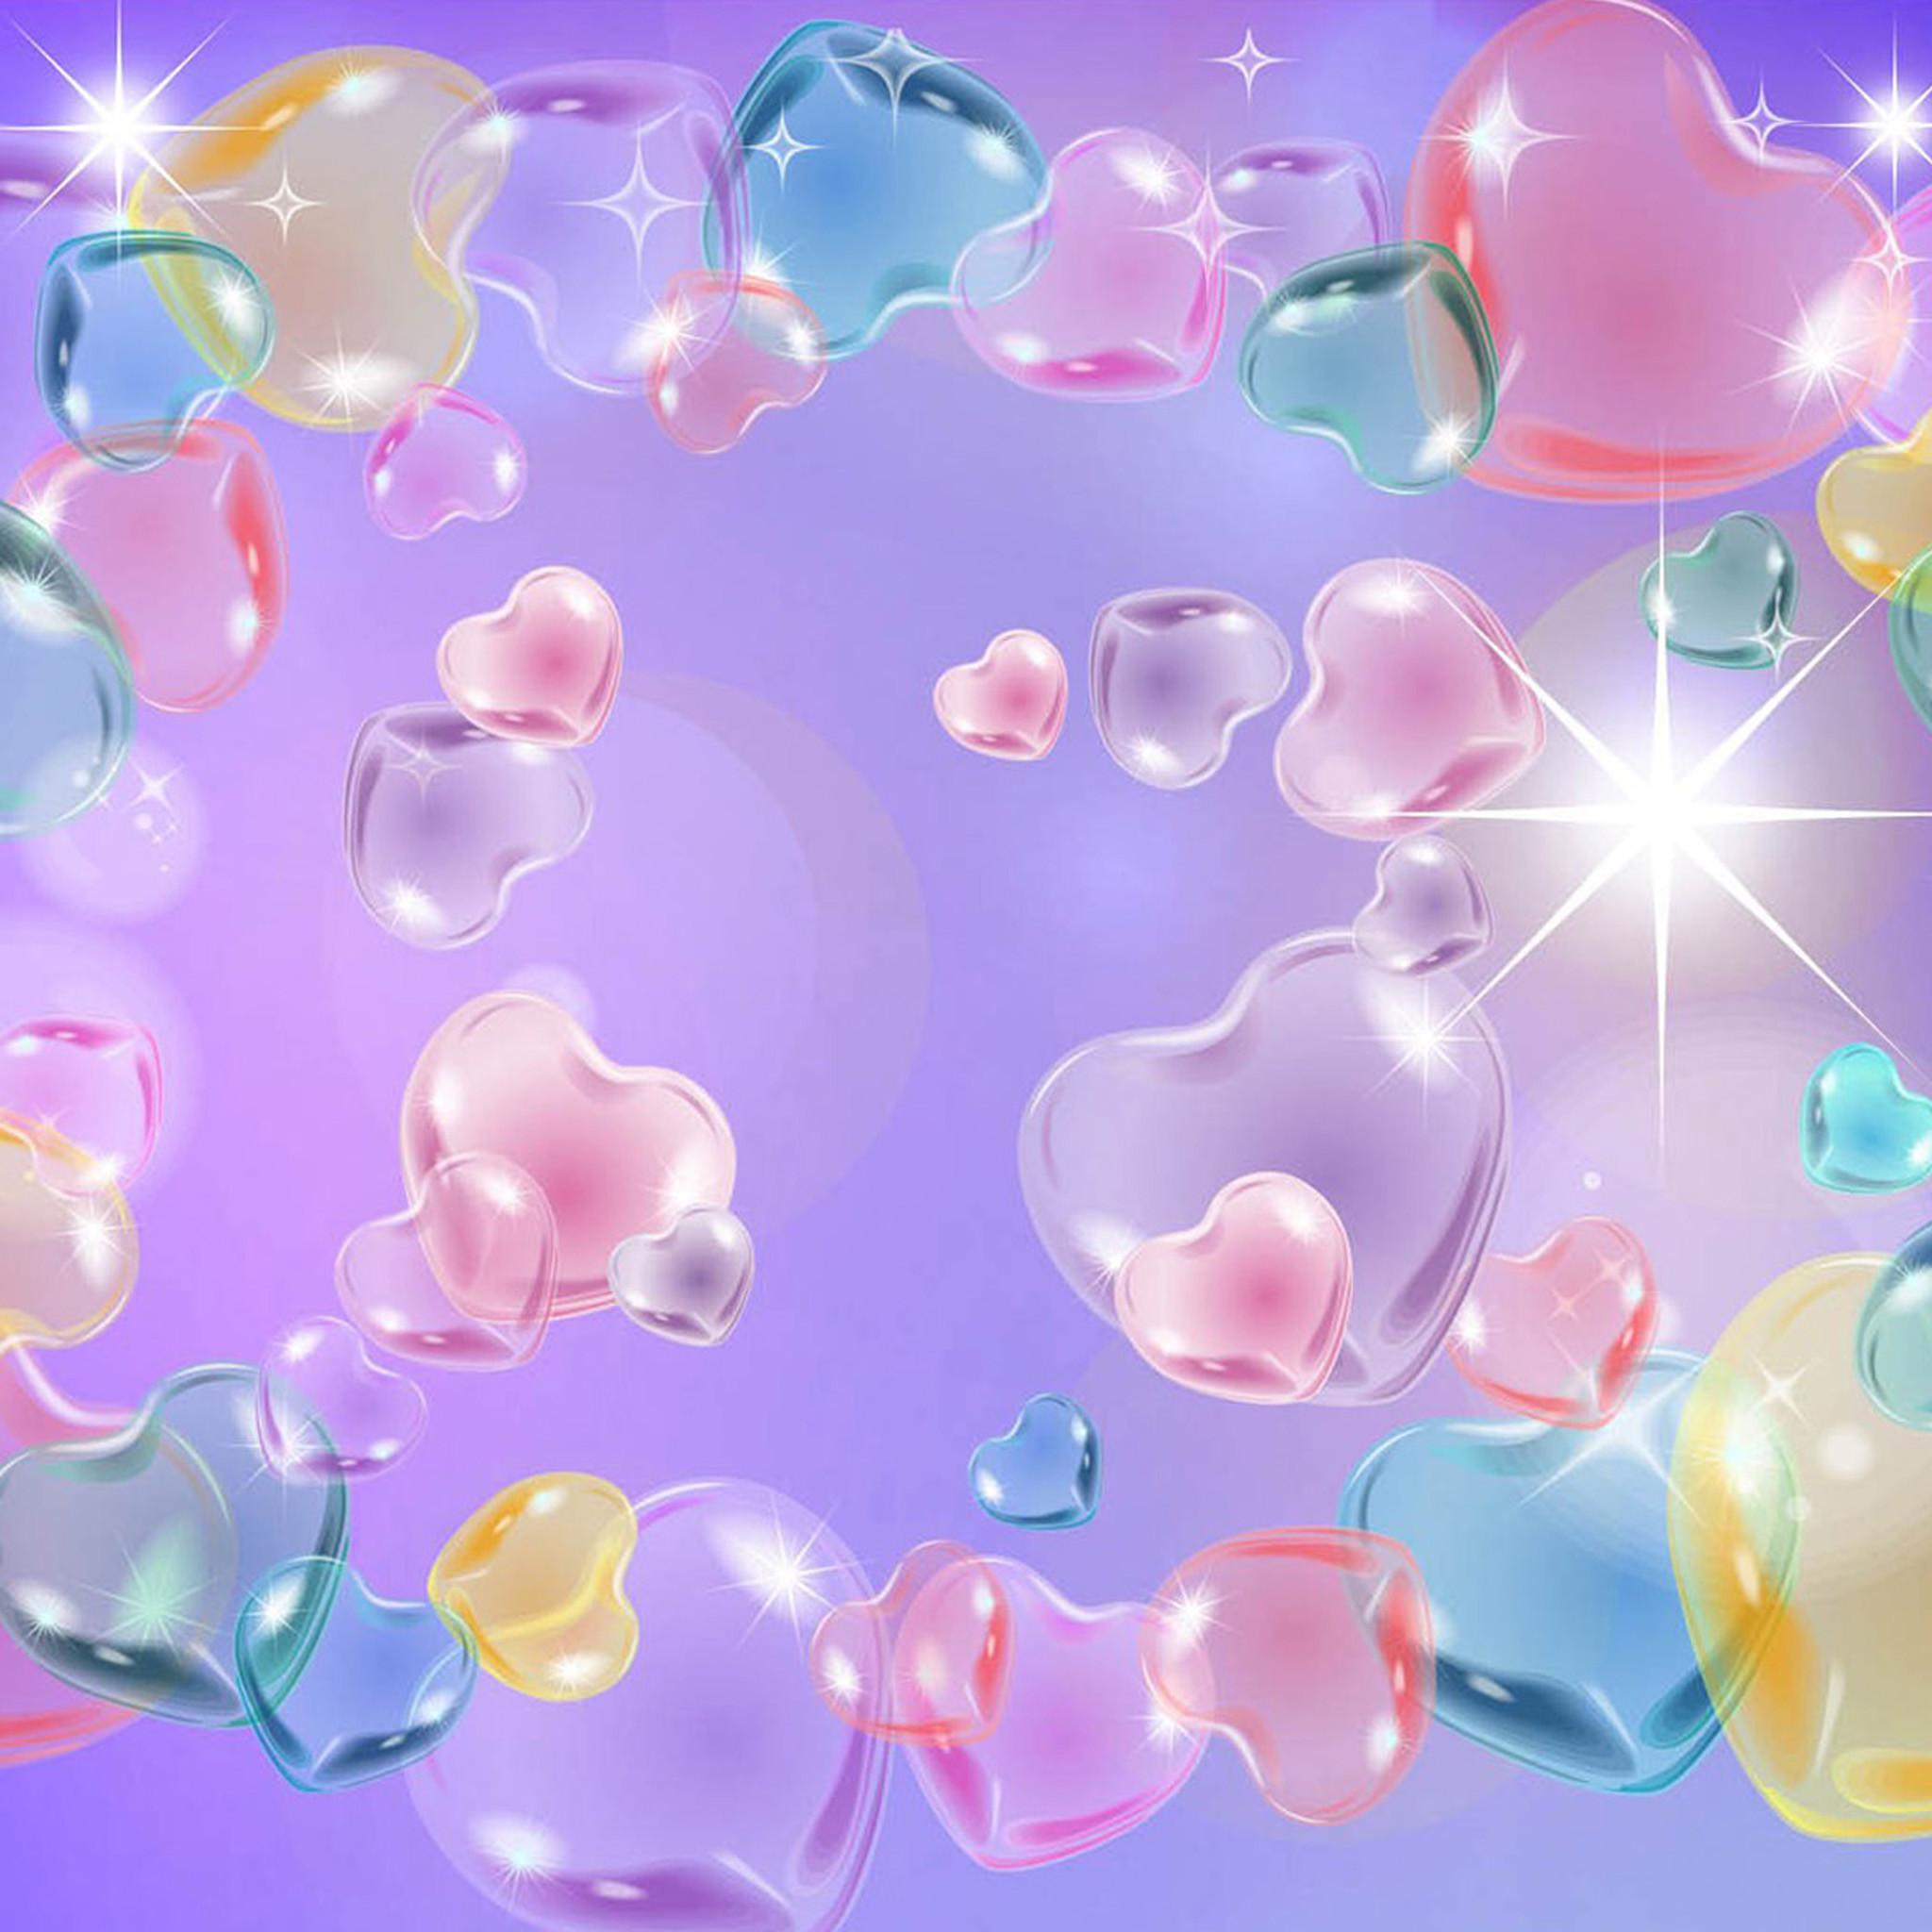 Bubble Wallpaper Hd Pink 3d Moving Bubbles Desktop Wallpaper 55 Images